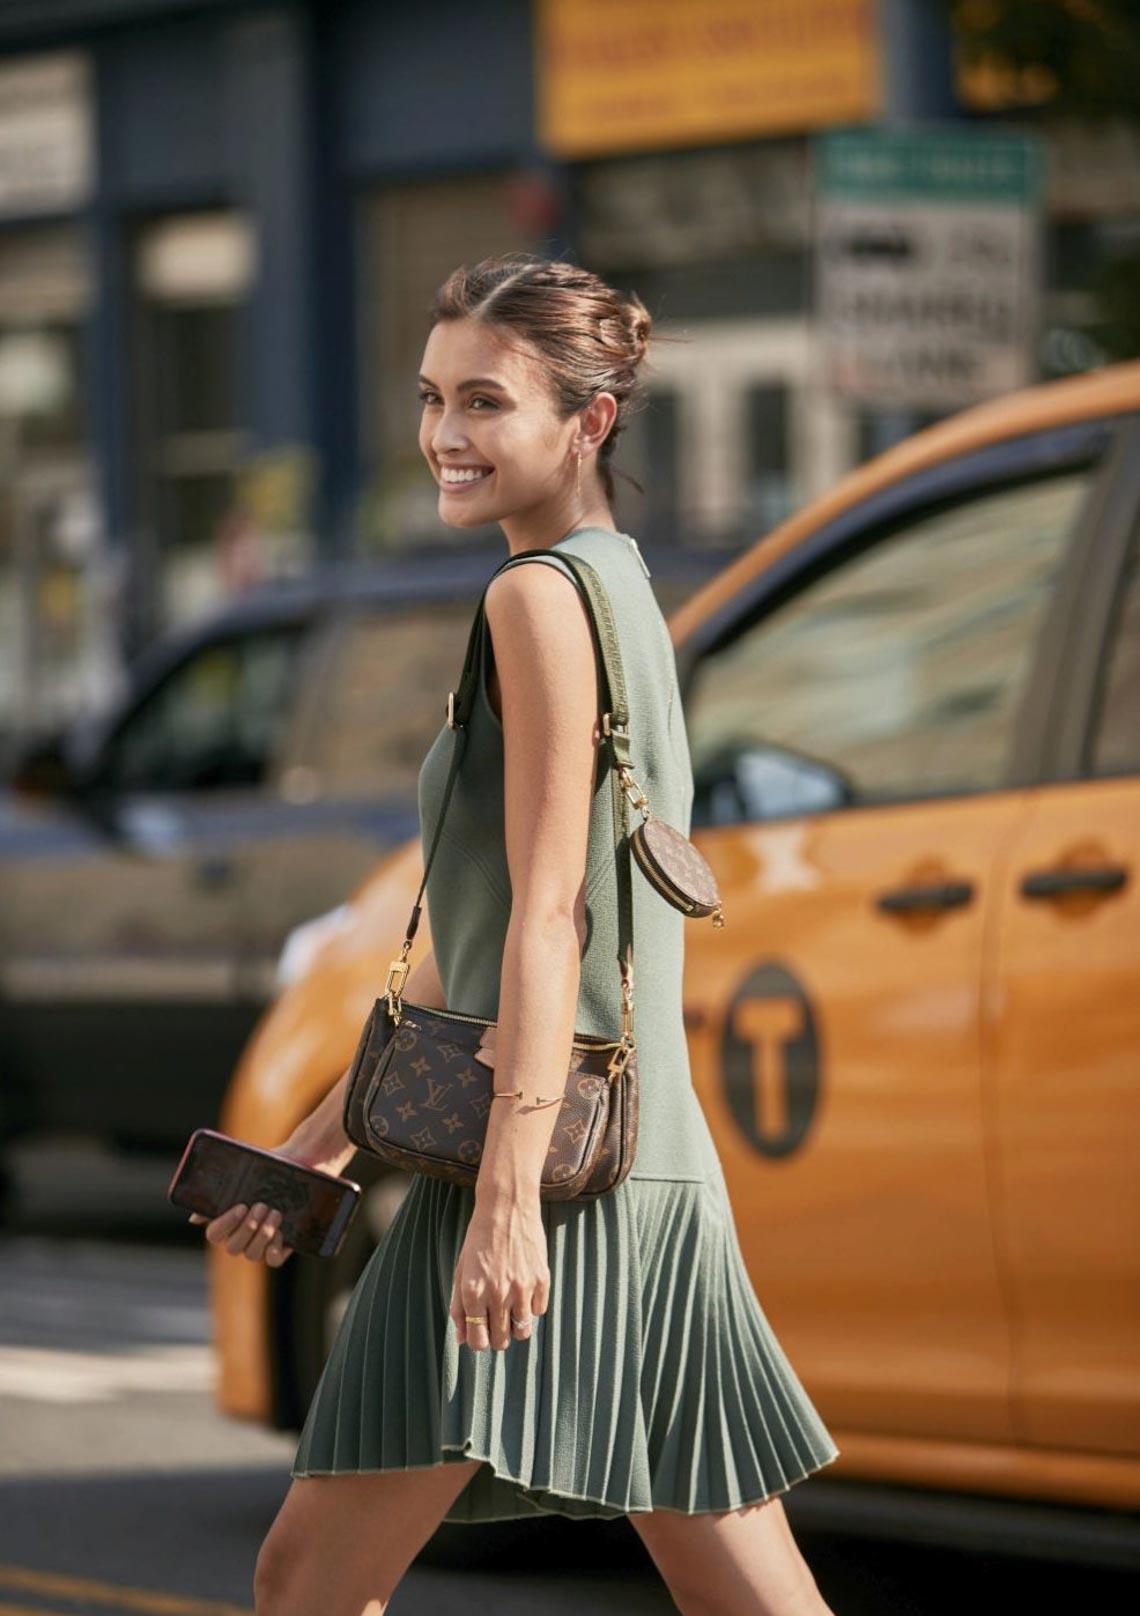 Multi Pochette - mẫu túi biến tấu mới của nhà Louis Vuitton - 2